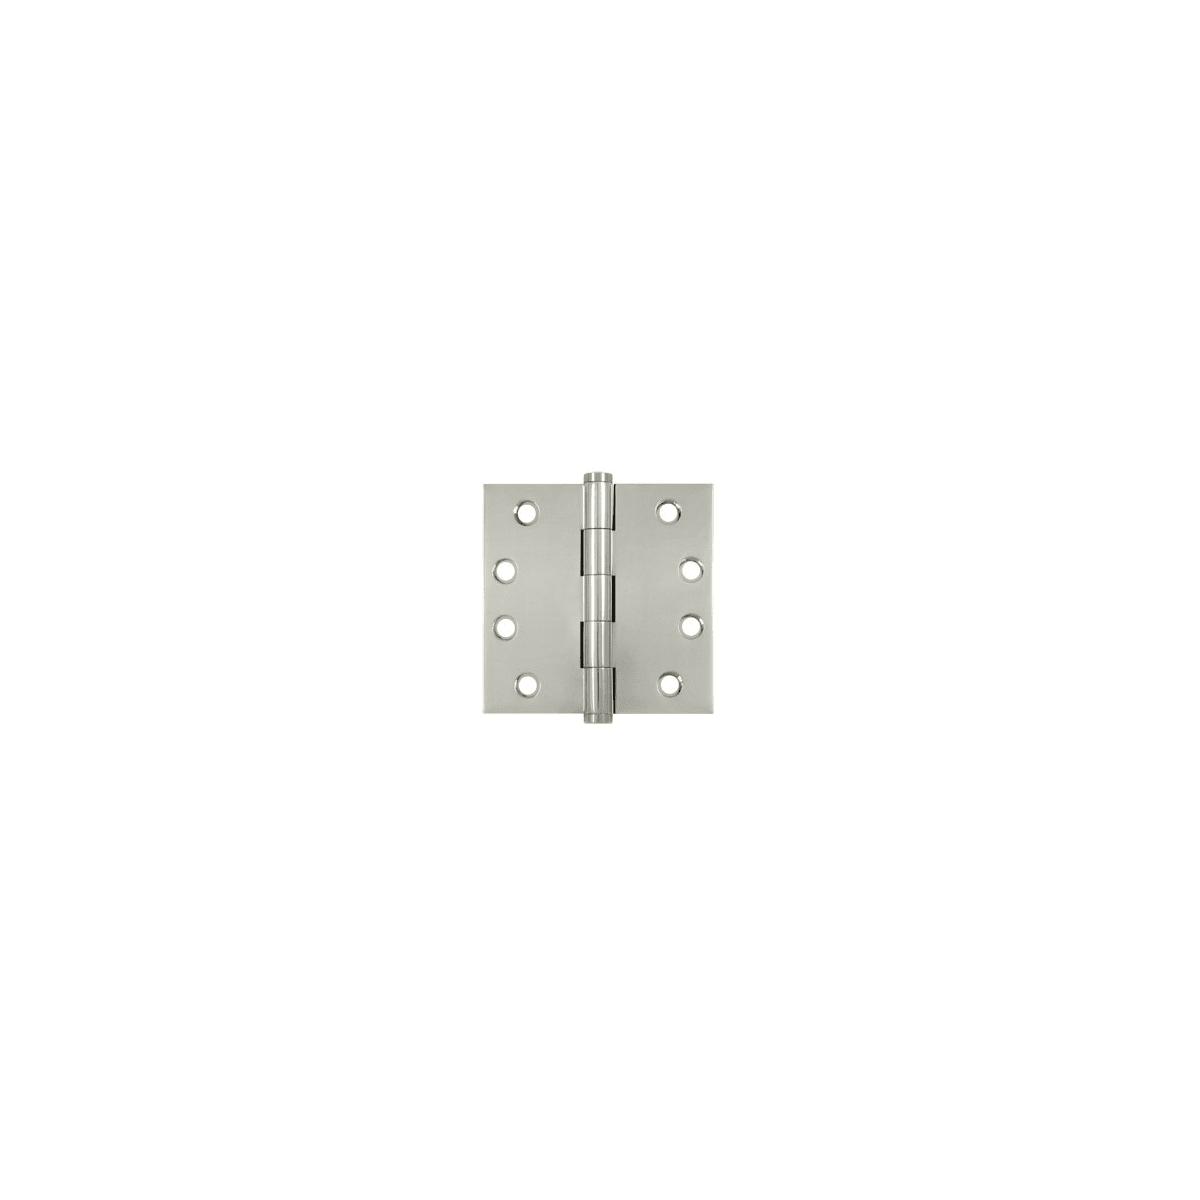 Deltana DSB43-UNL Solid Brass 4-Inch x 4-Inch Square Hinge